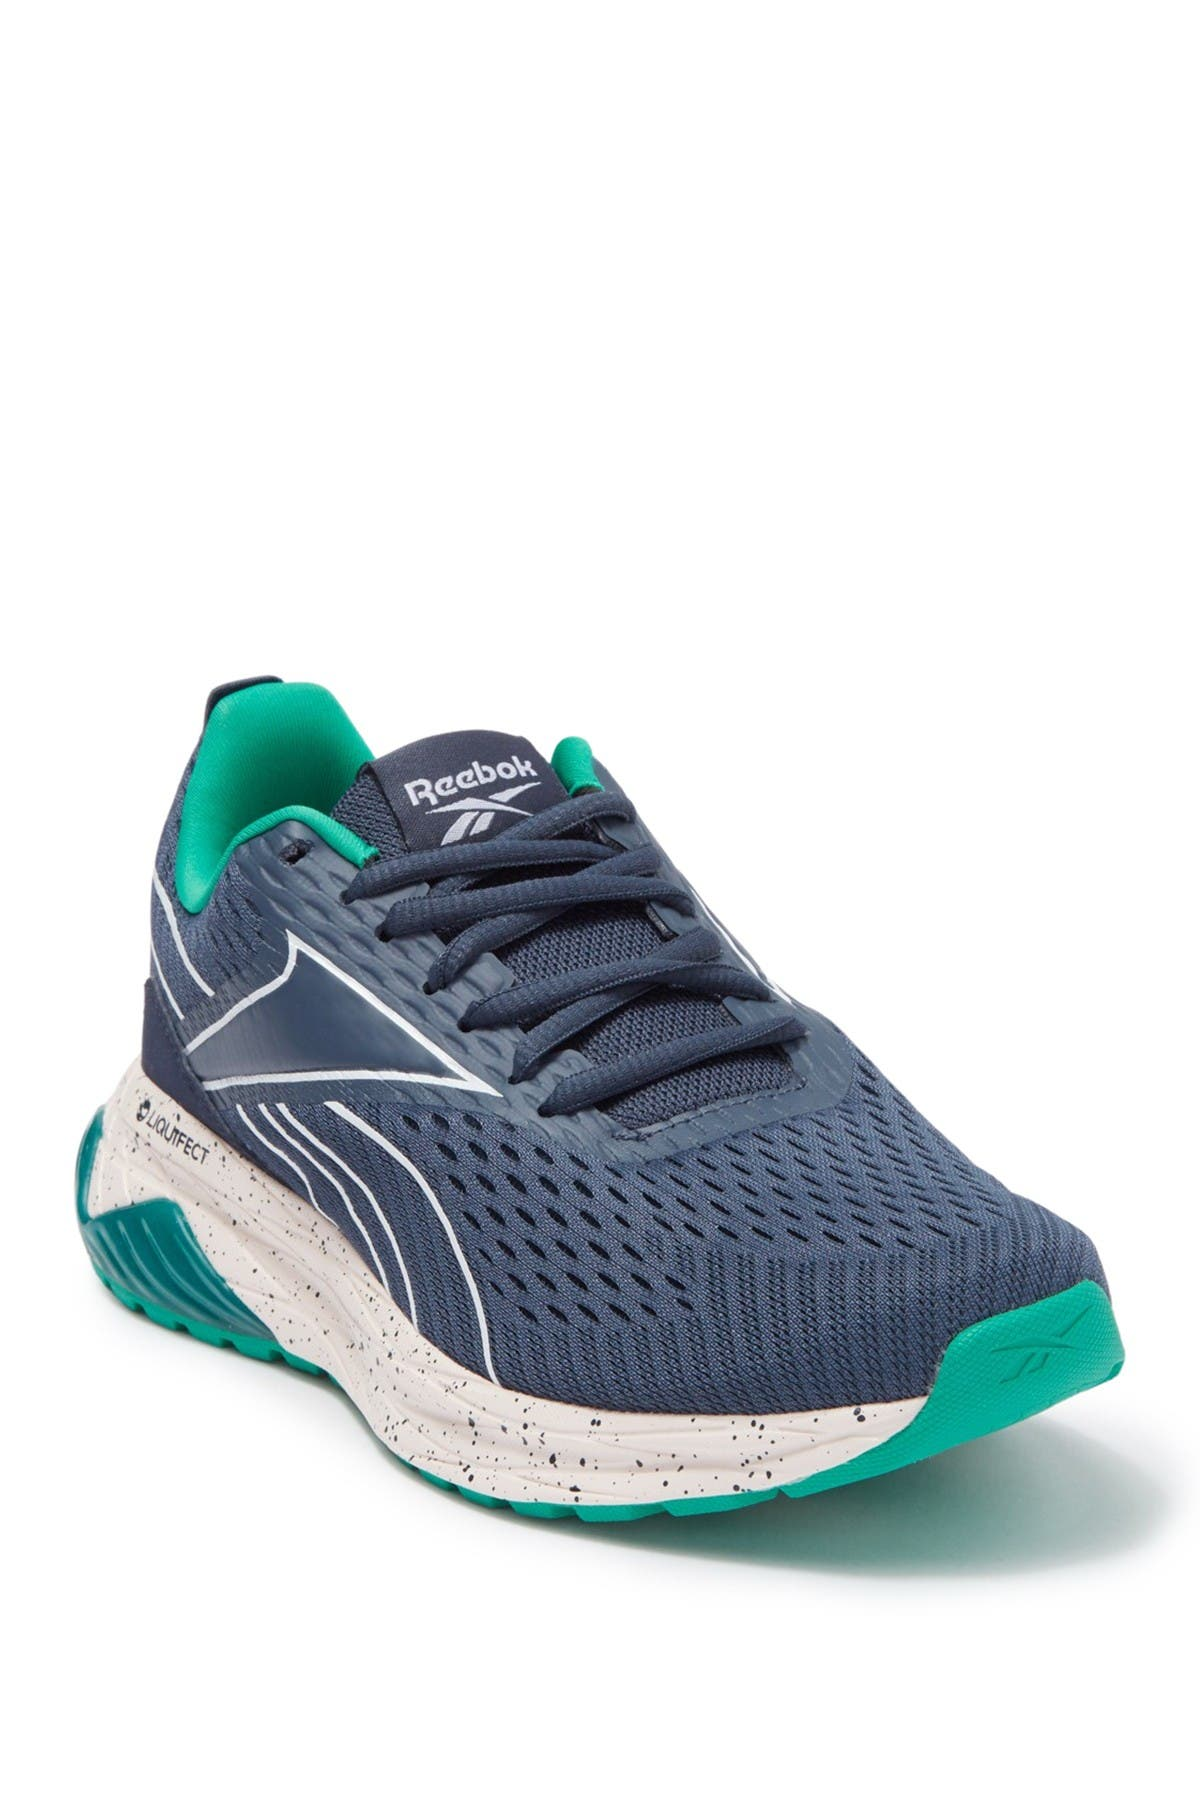 Image of Reebok Liquifect 180 2.0 SPT Running Sneaker